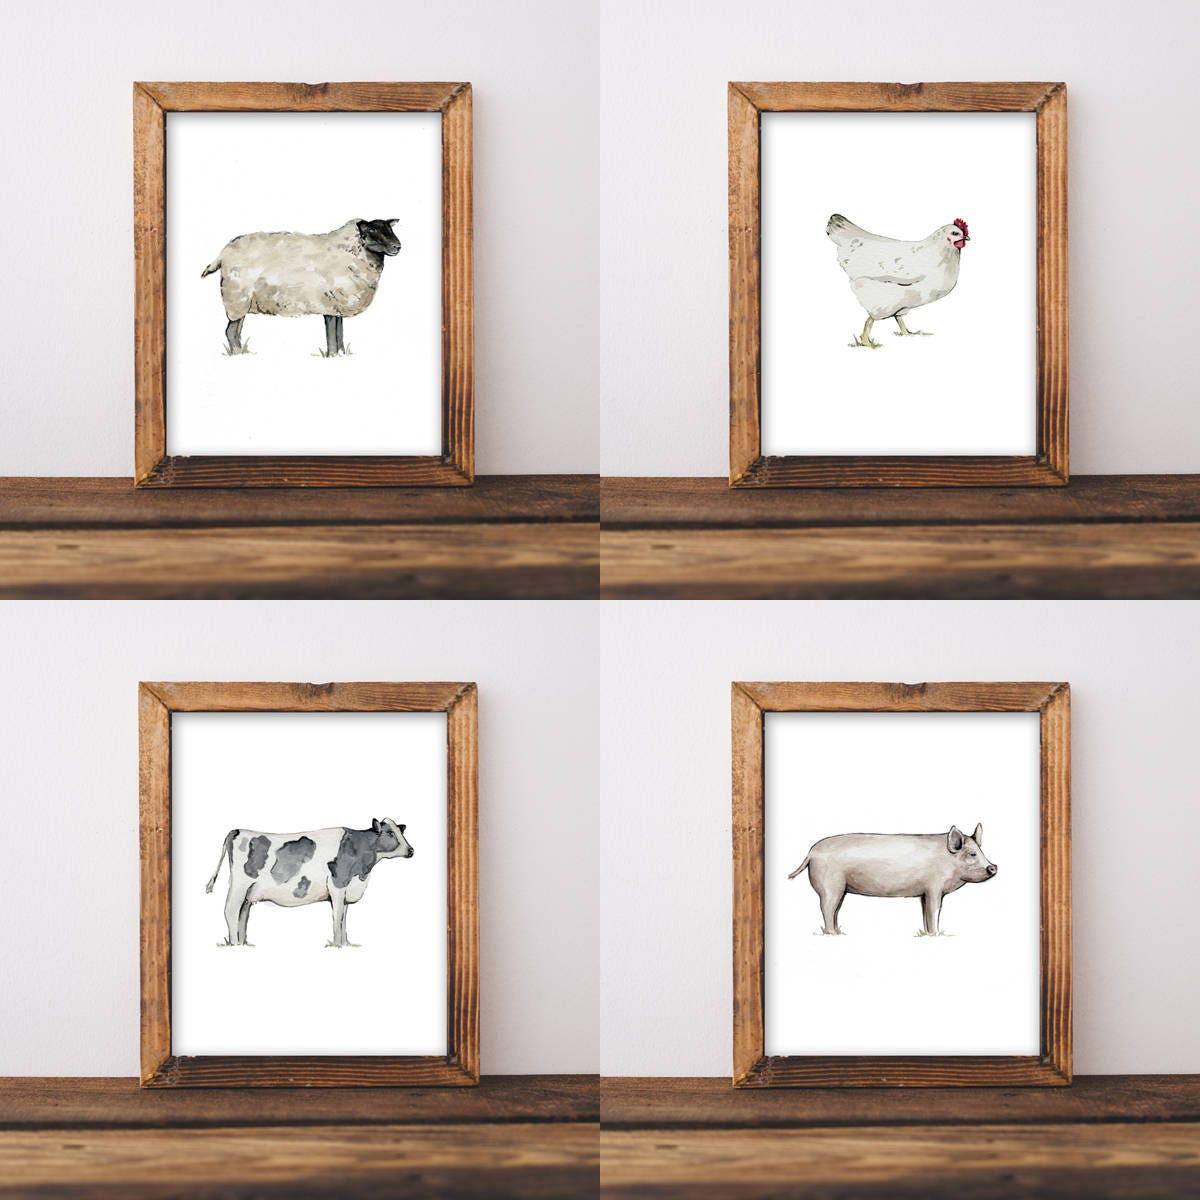 Farmhouse Wall Art Nursery Shabby Chic Animal Room Decor Farm Painting Chicken Cow Pig Sheep 8x10